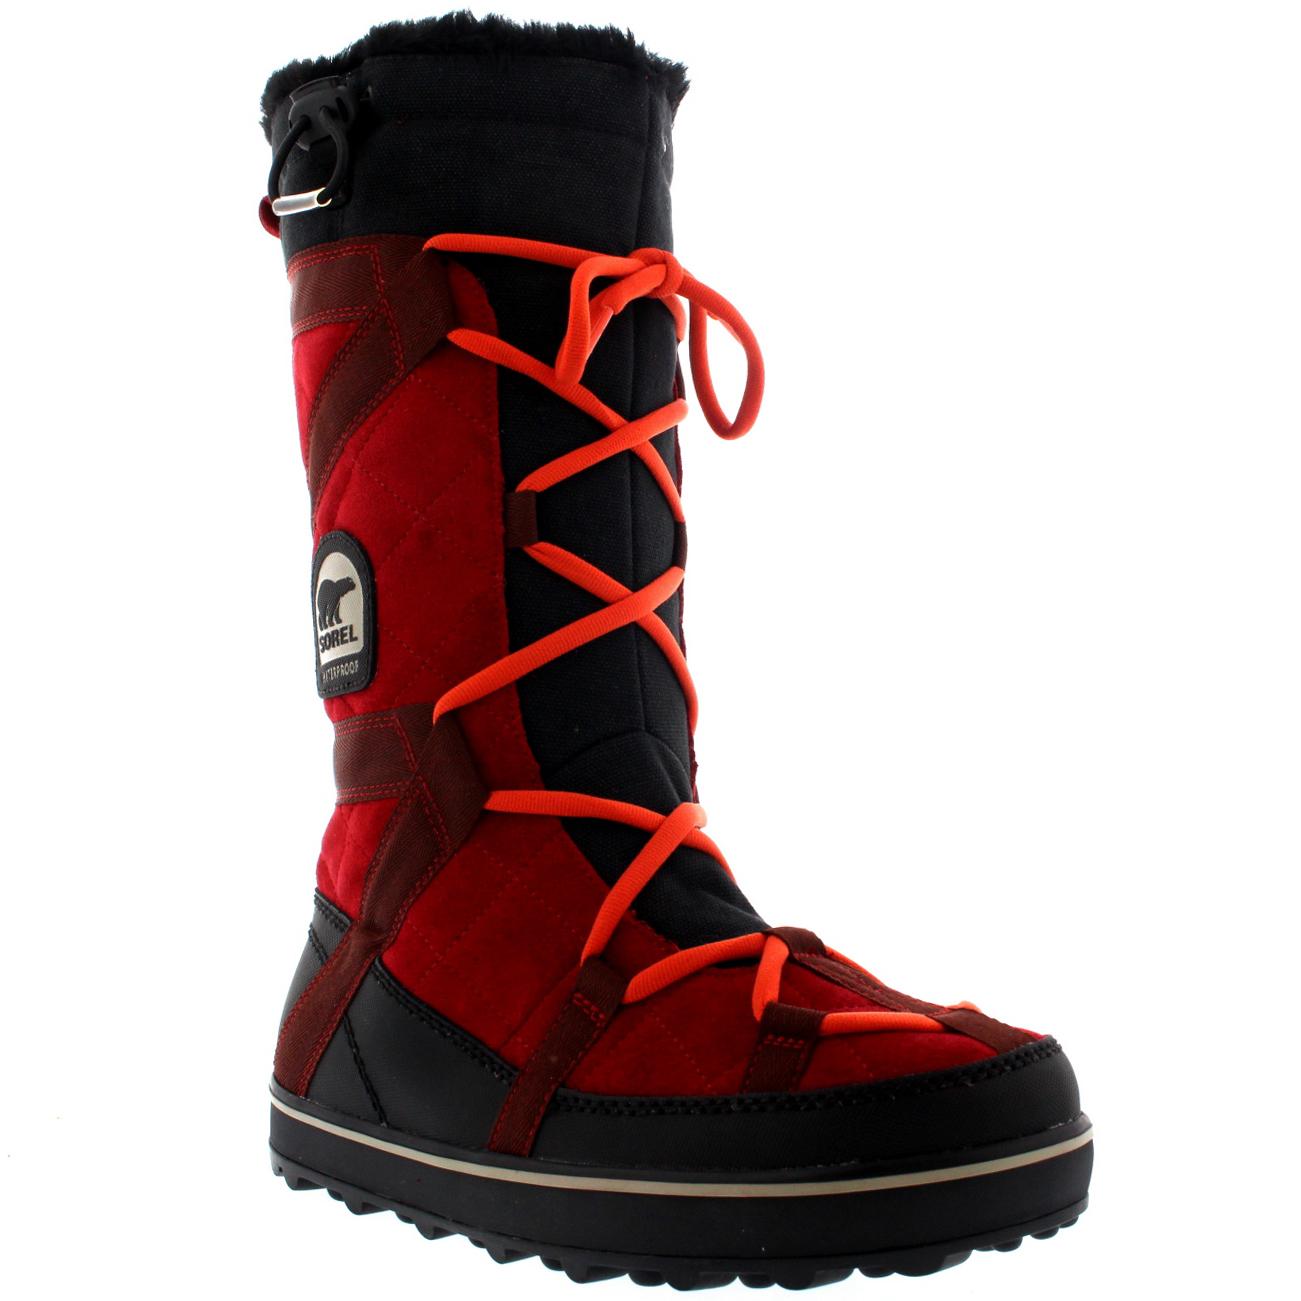 Womens Sorel Glacy Explorer Fur Lined Winter Snow Rain ...